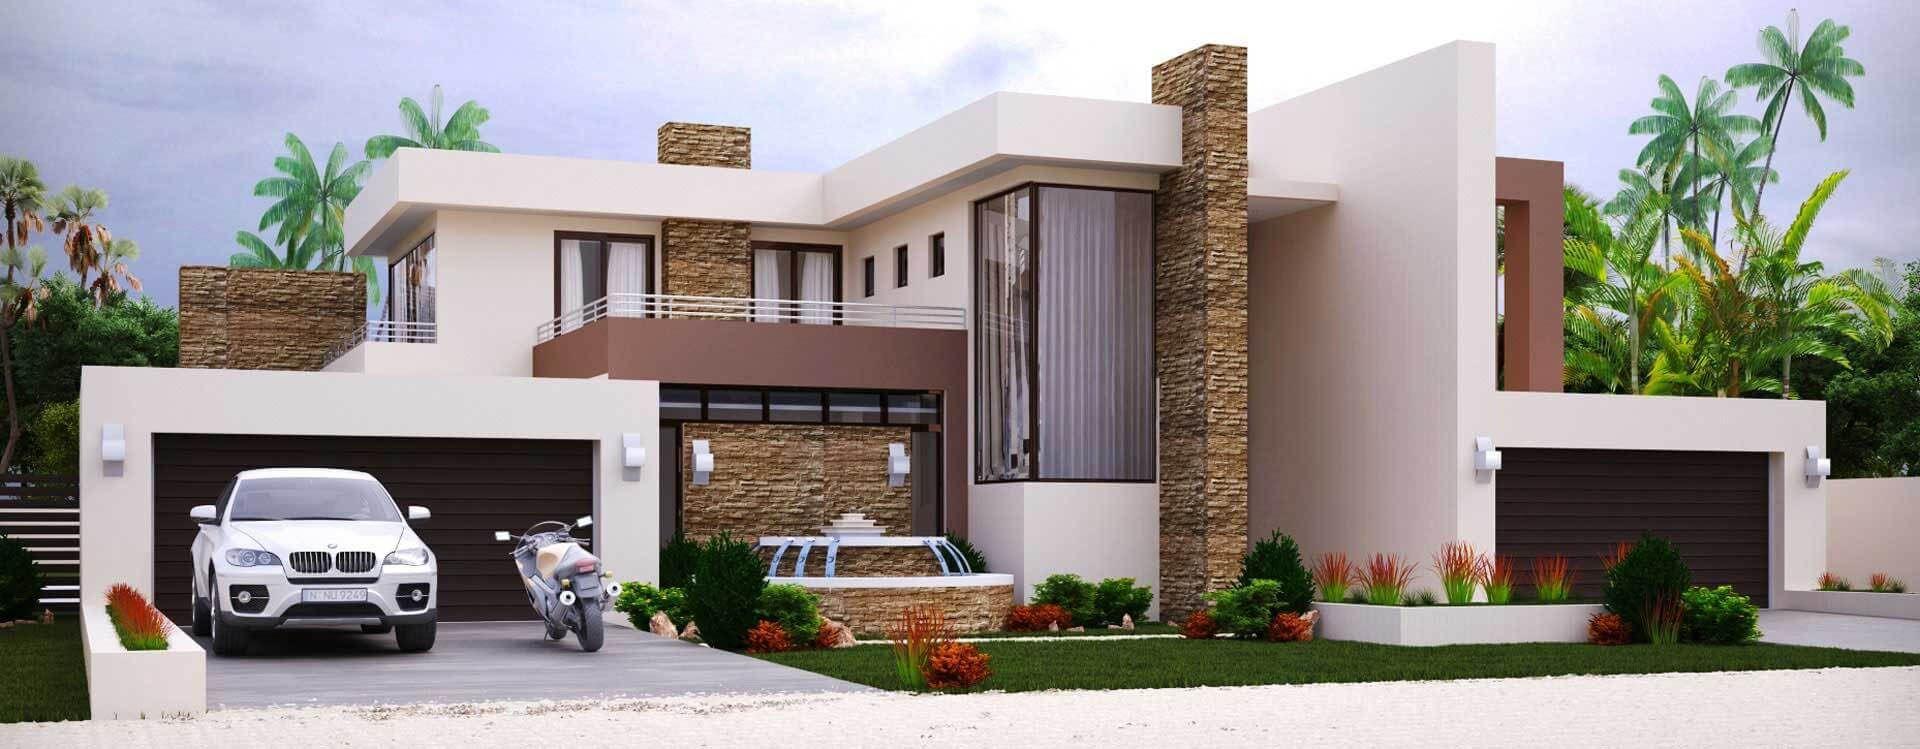 4 Bedroom House Plan 8211 M497d House Plans For Sale Modern Style House Plans Modern House Design